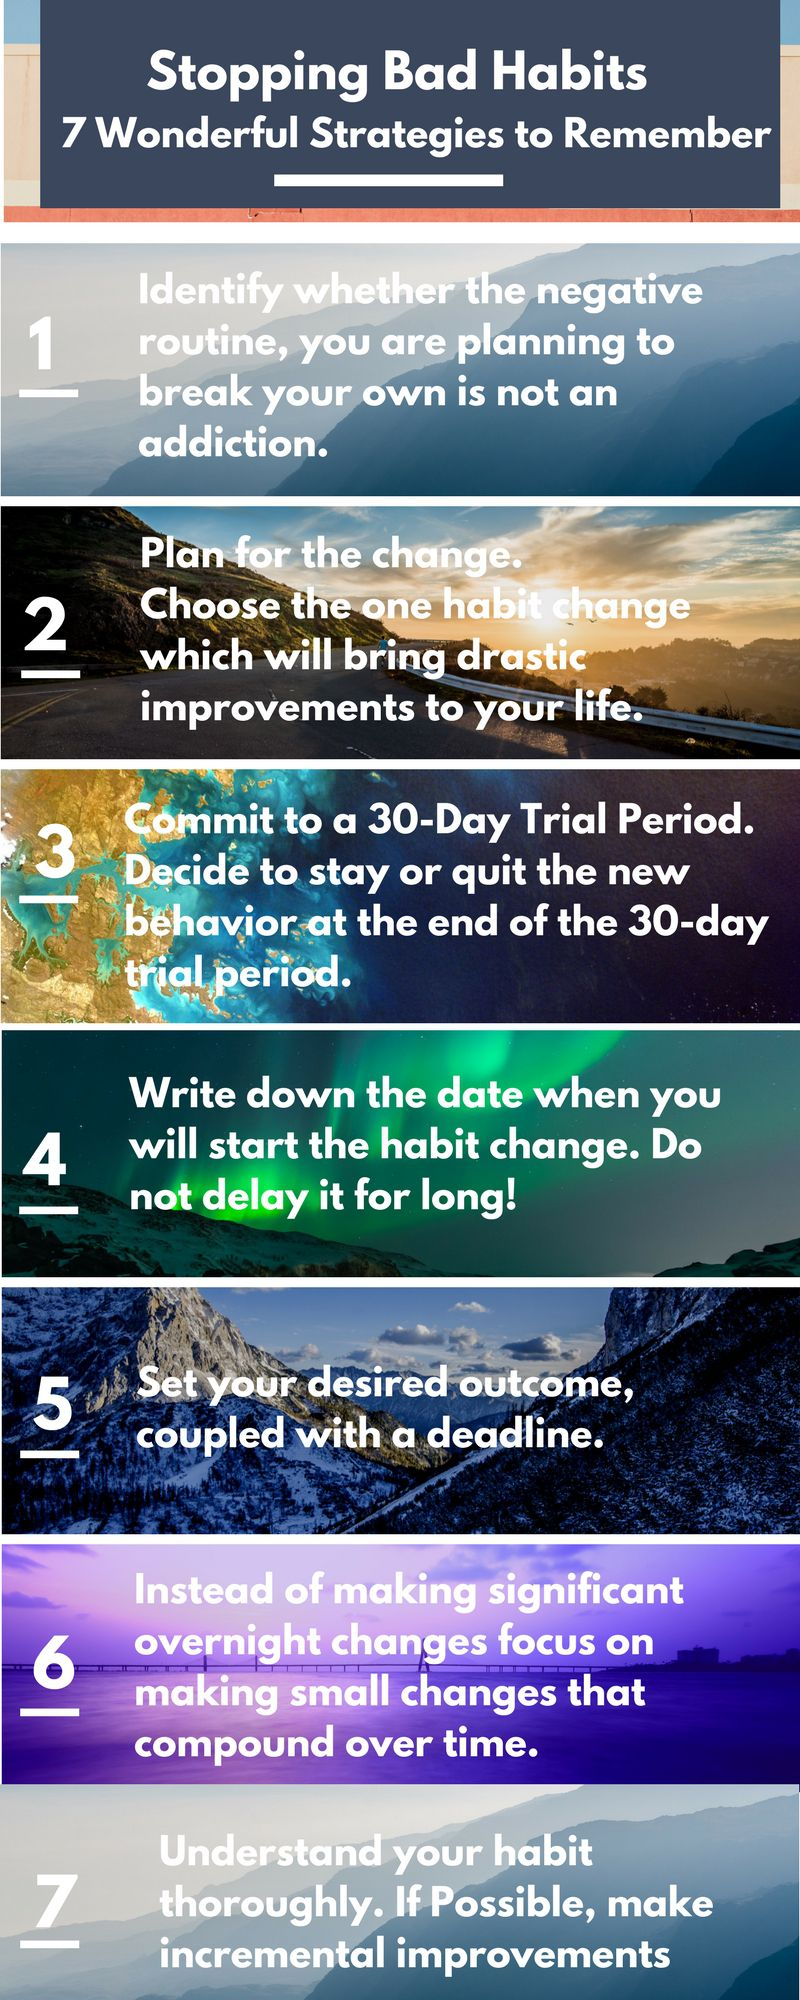 Stopping Bad Habits